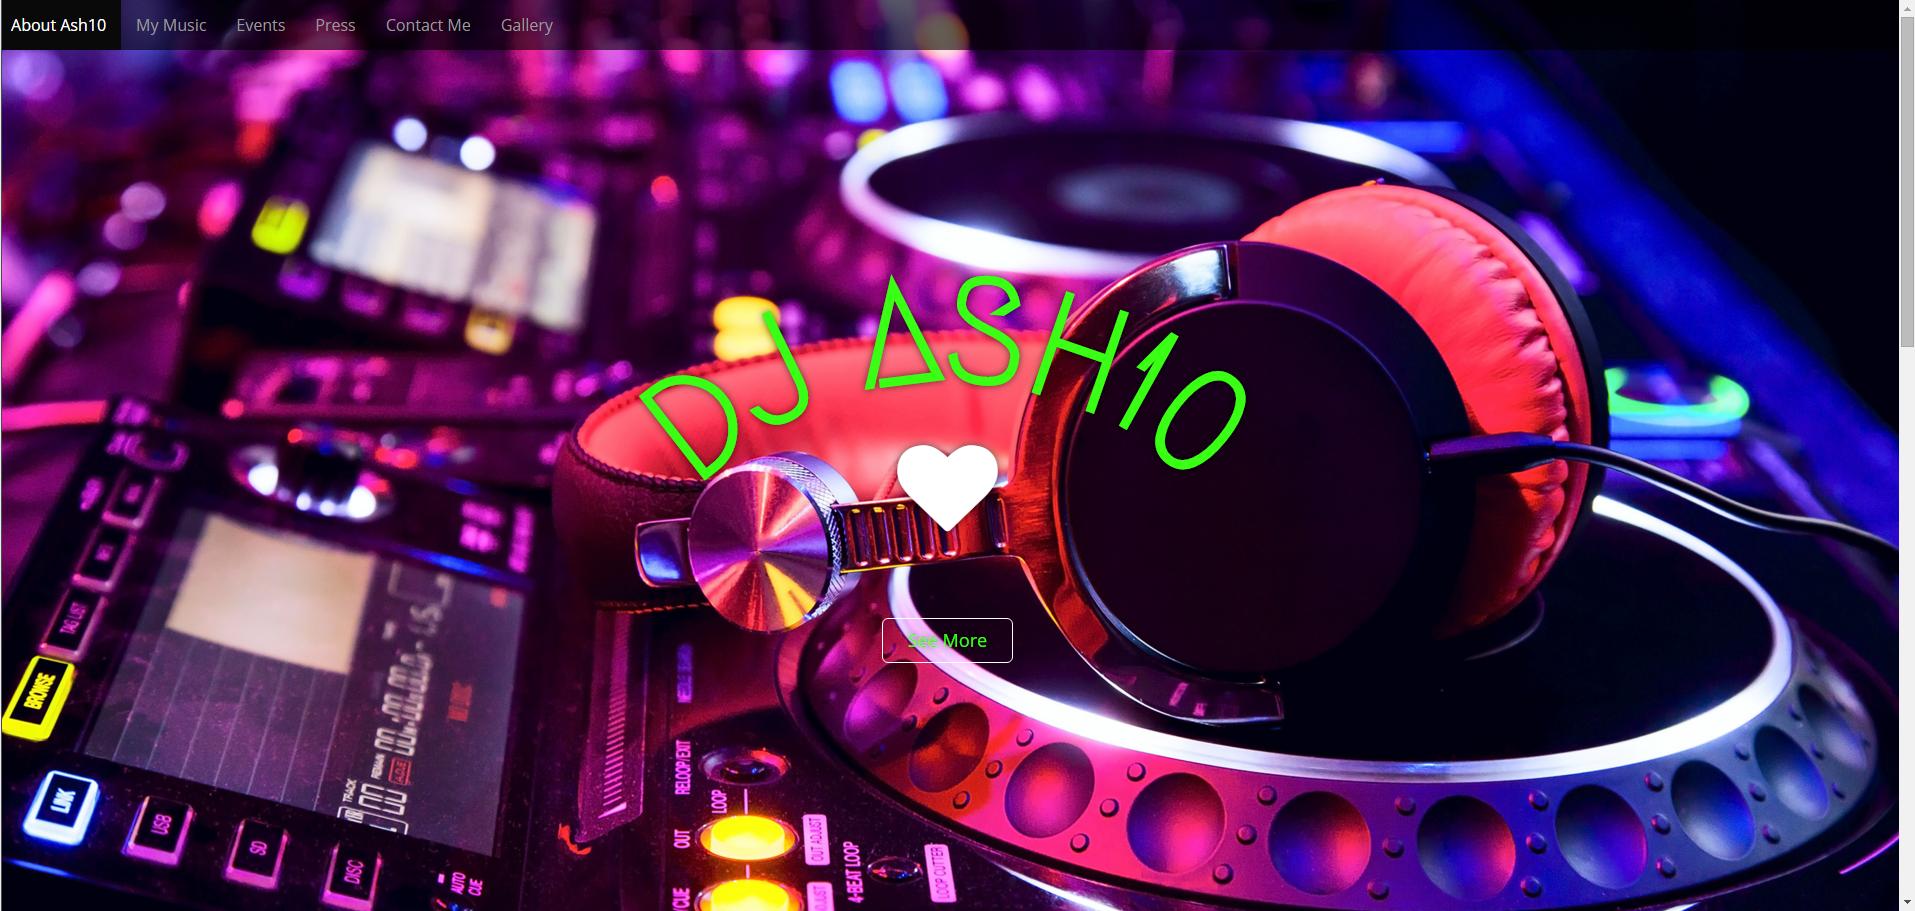 ash10musiccom